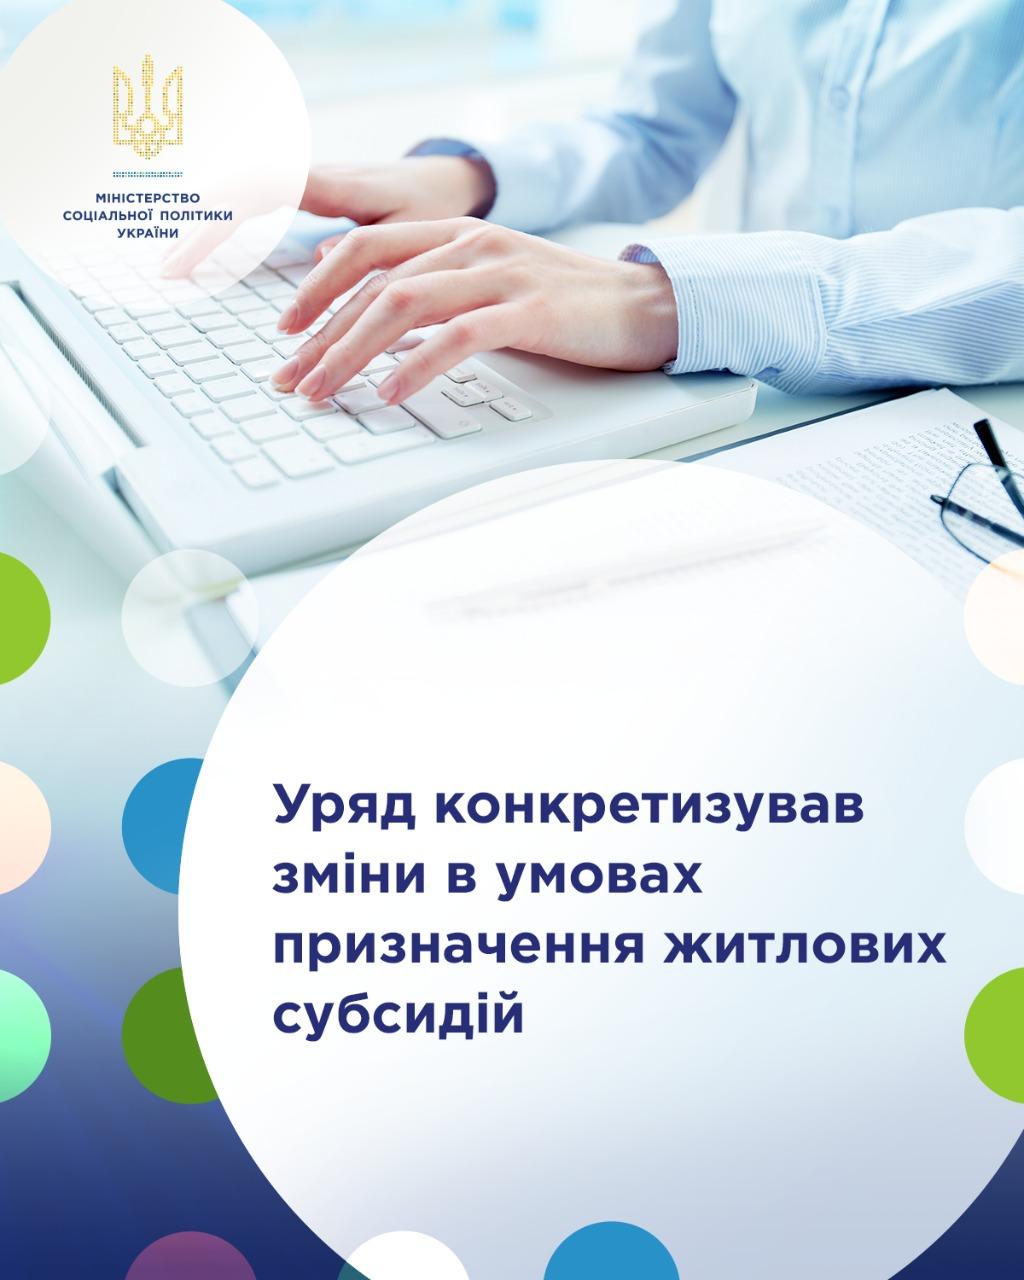 https://www.msp.gov.ua/files/pictures/2021/1905-2.jpg